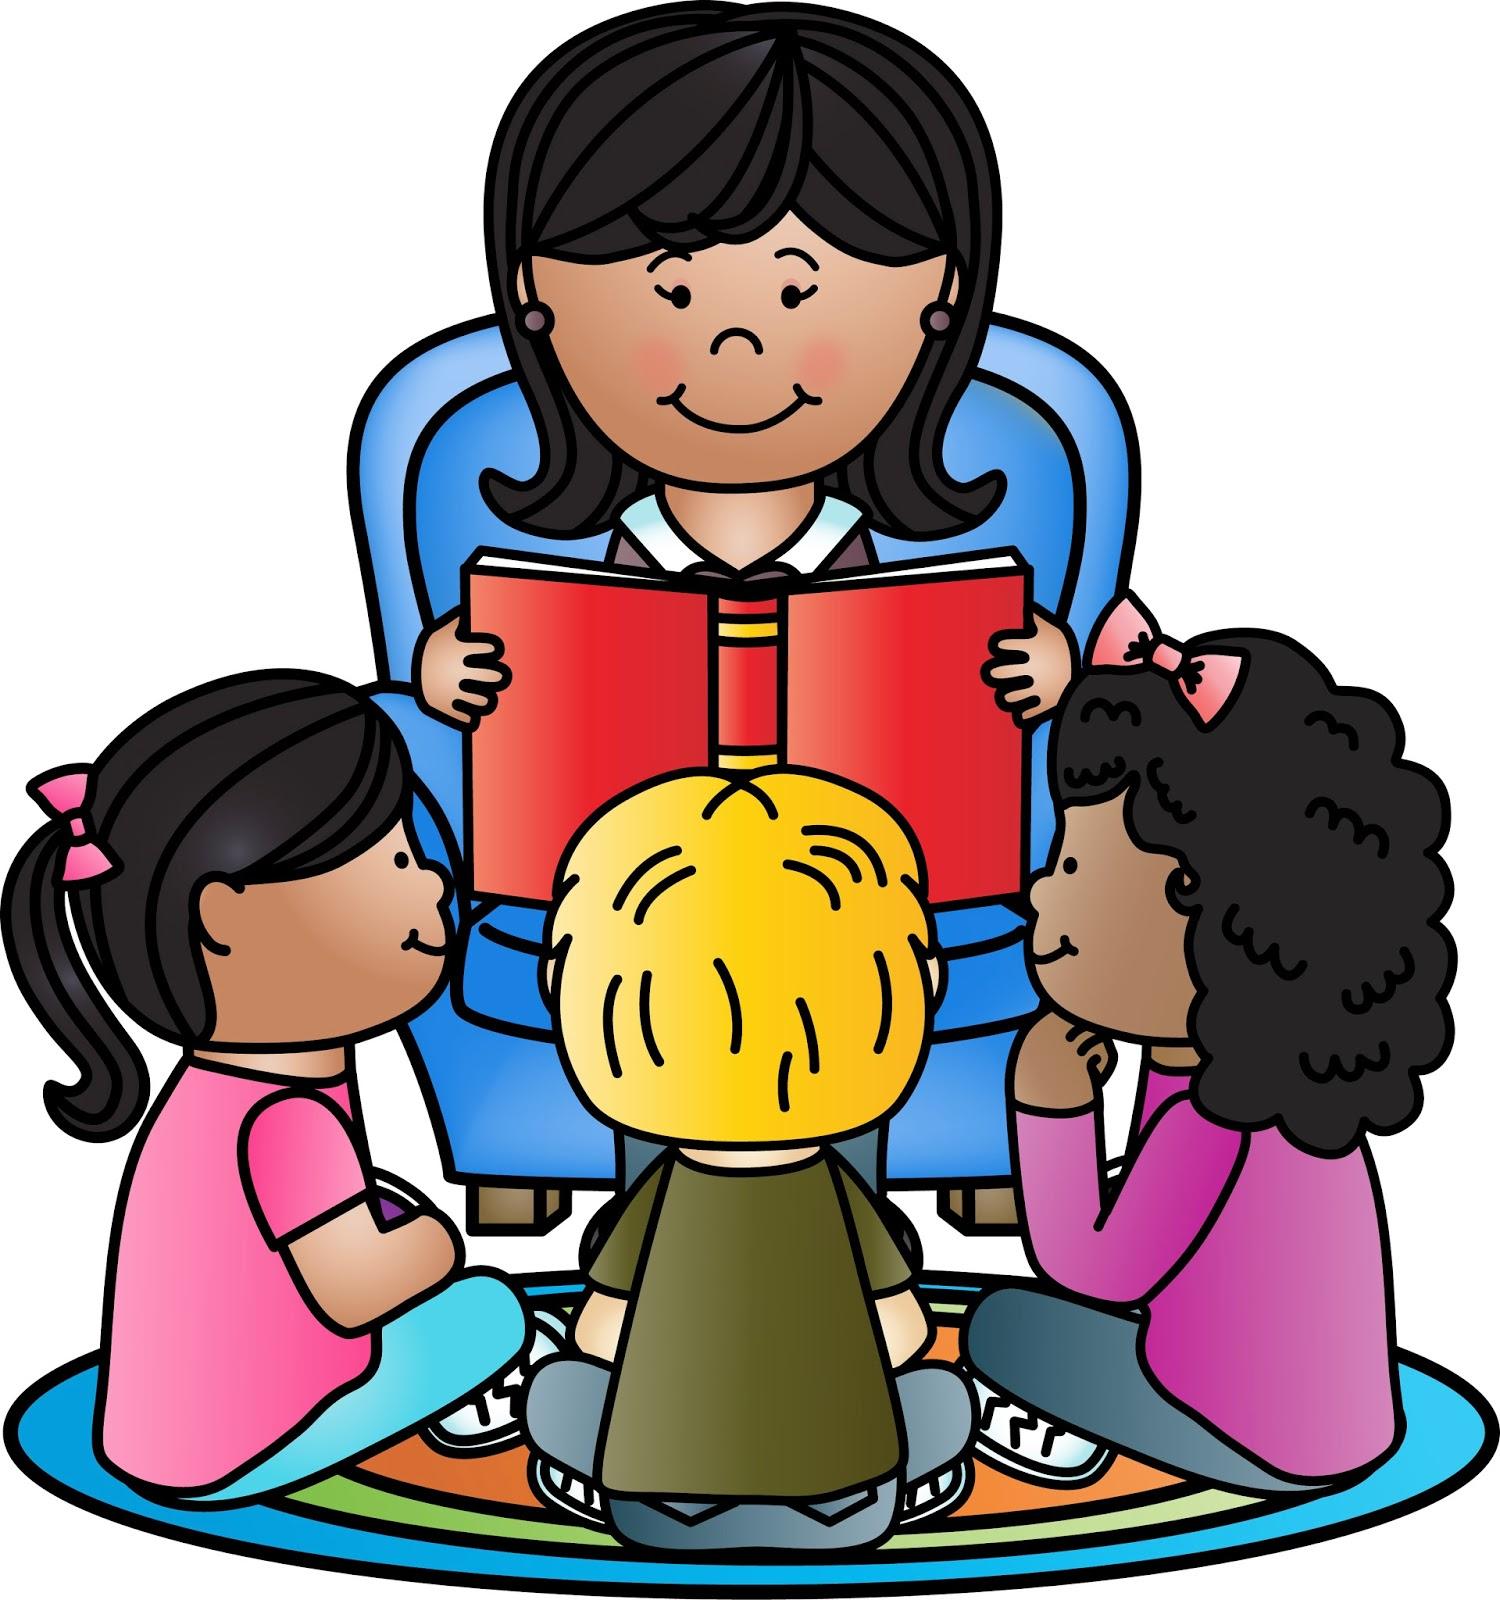 Listen to the teacher clipart jpg library library Listen Clipart | Free download best Listen Clipart on ... jpg library library